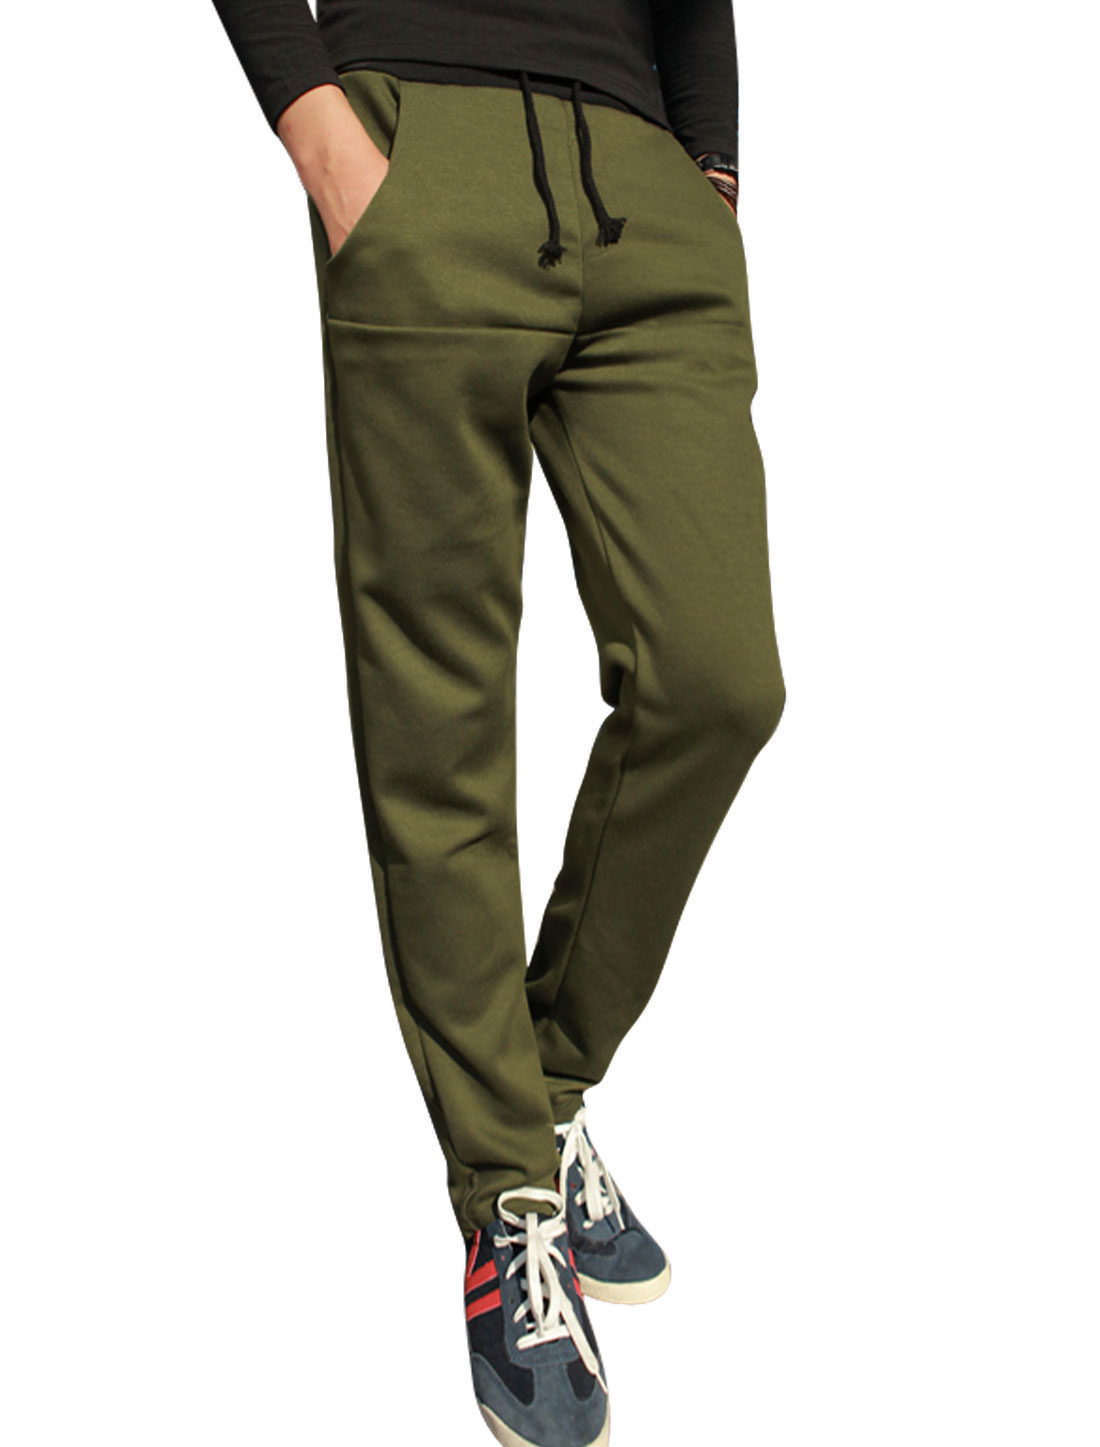 Man Multi Pockets Elastic Waist Casual Pants Army Green W30